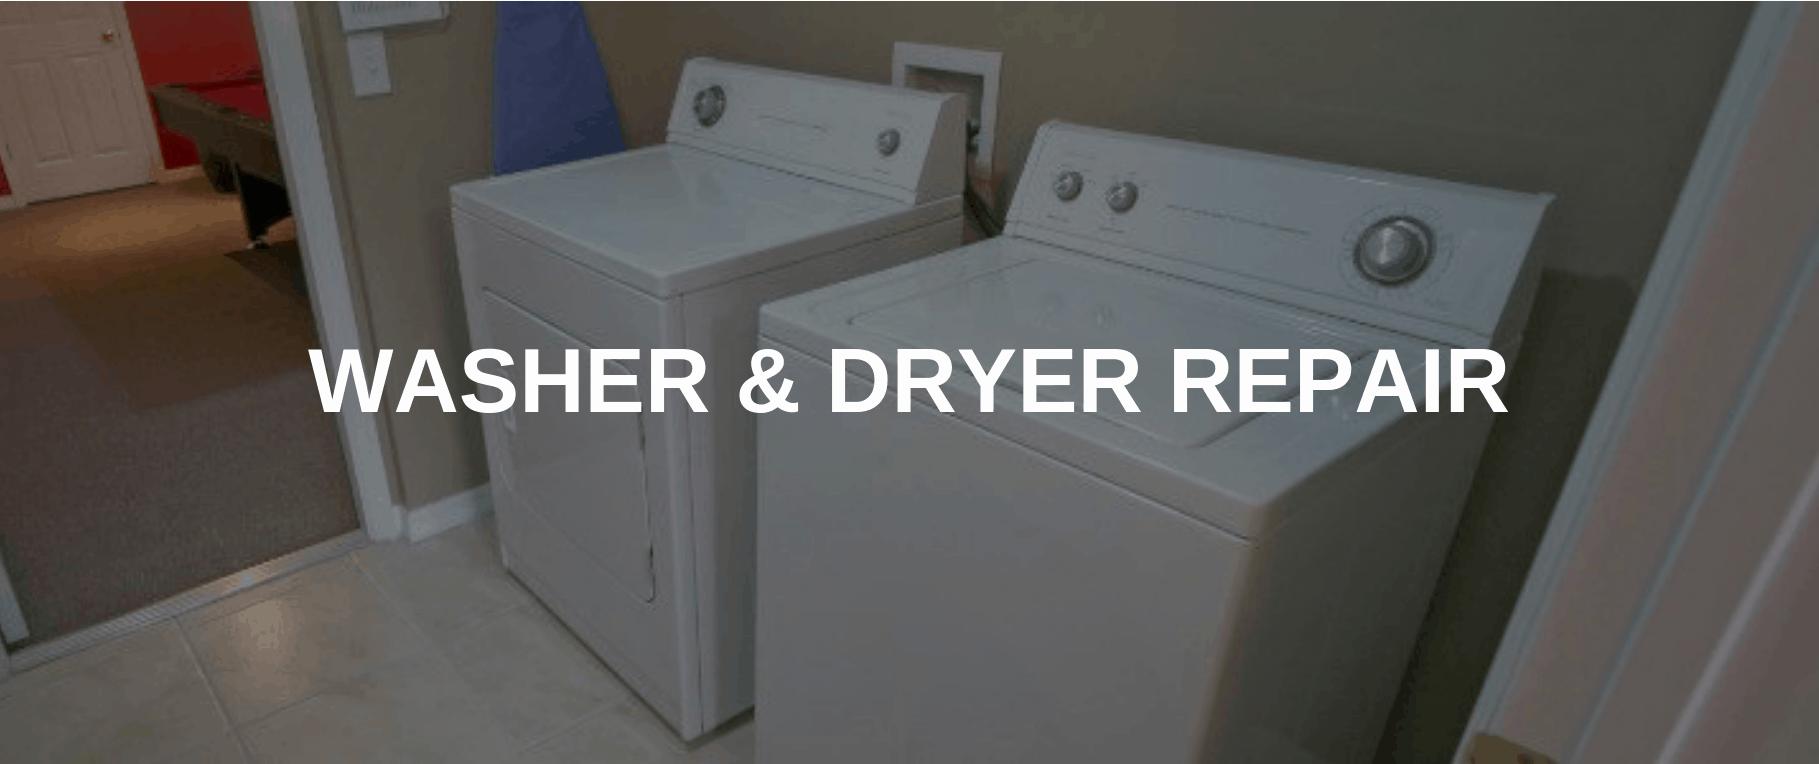 washing machine repair league city